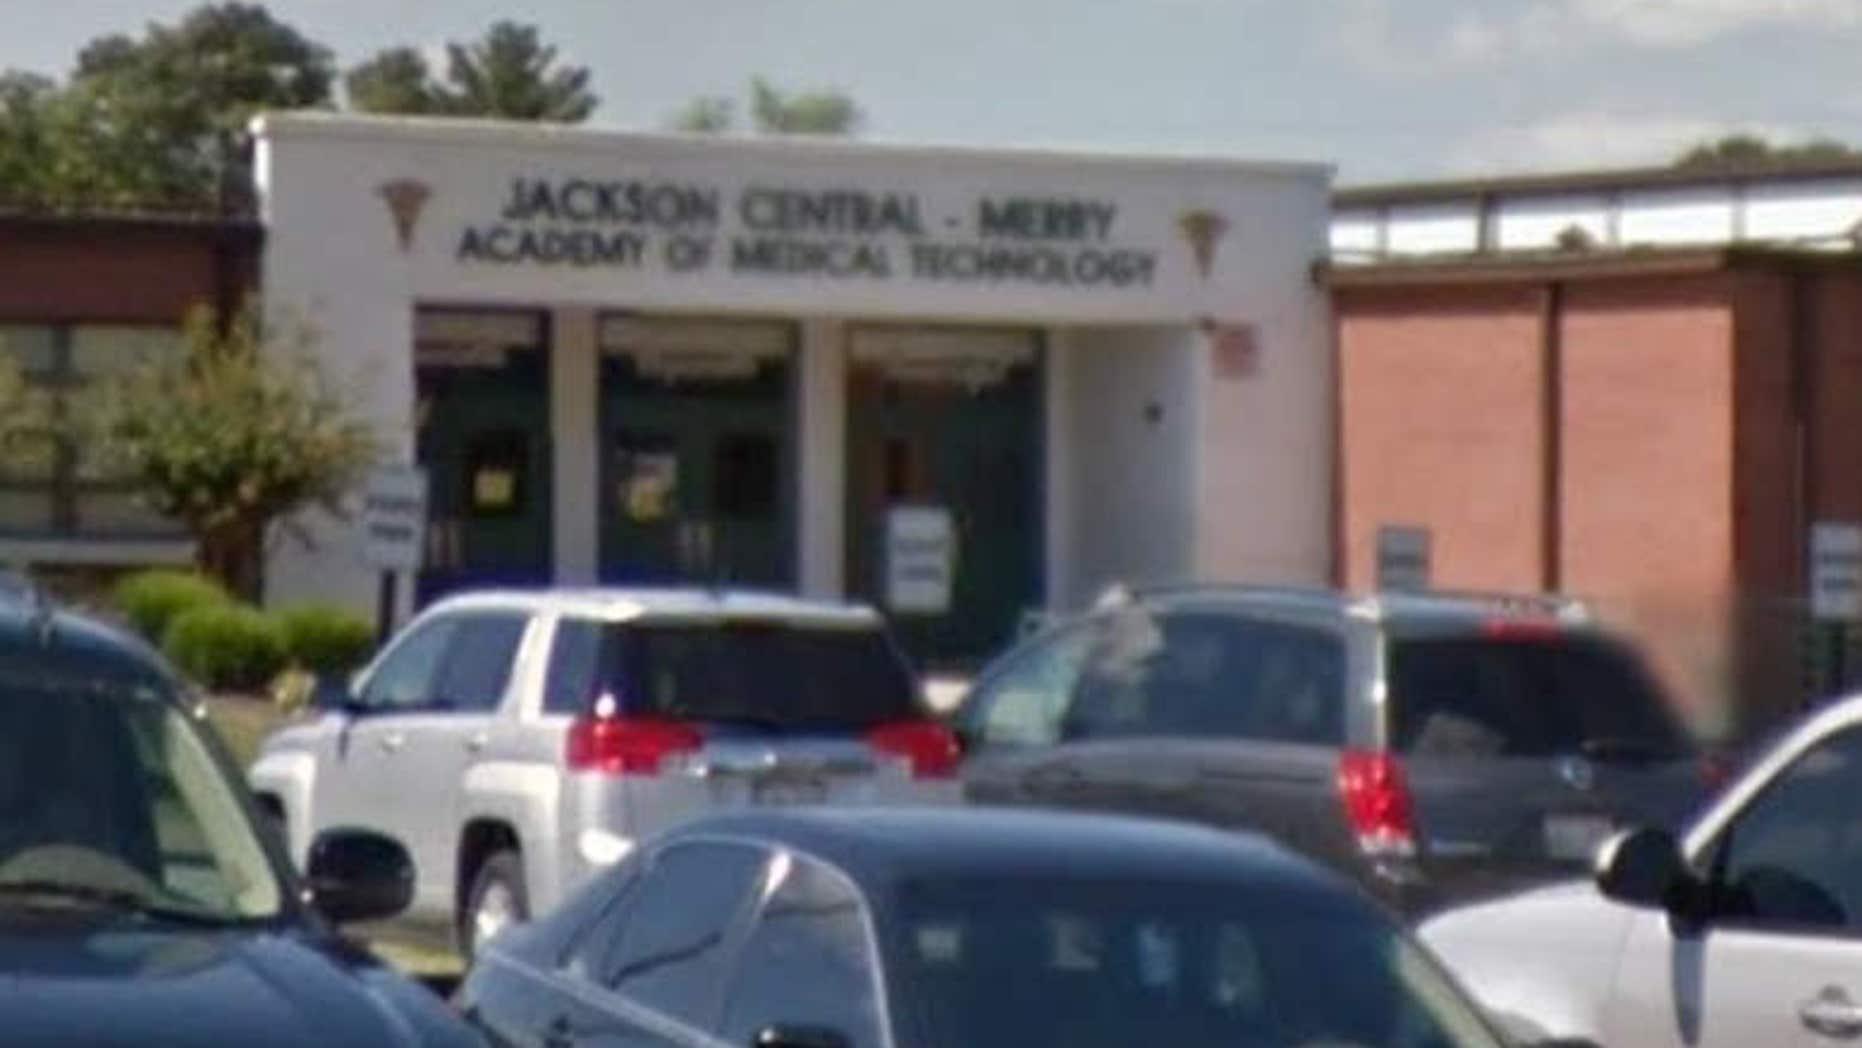 Jackson Central-Merry High School